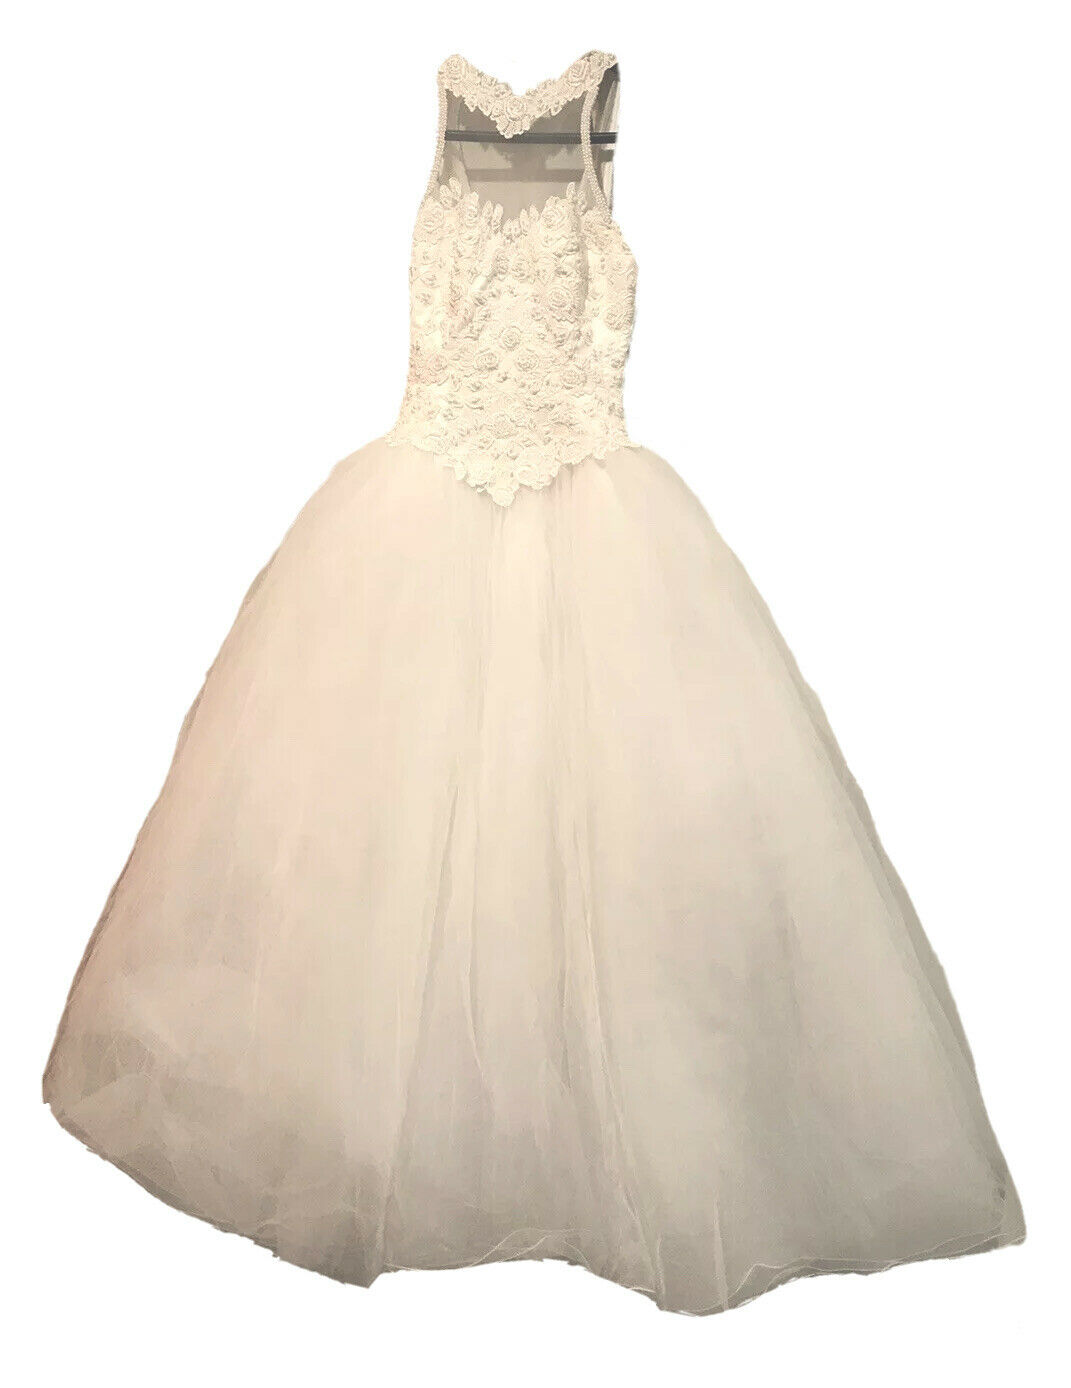 VTG Demetrios Bridal Wedding Dress Size 6 Beaded Front Lace Illusion Style 3657